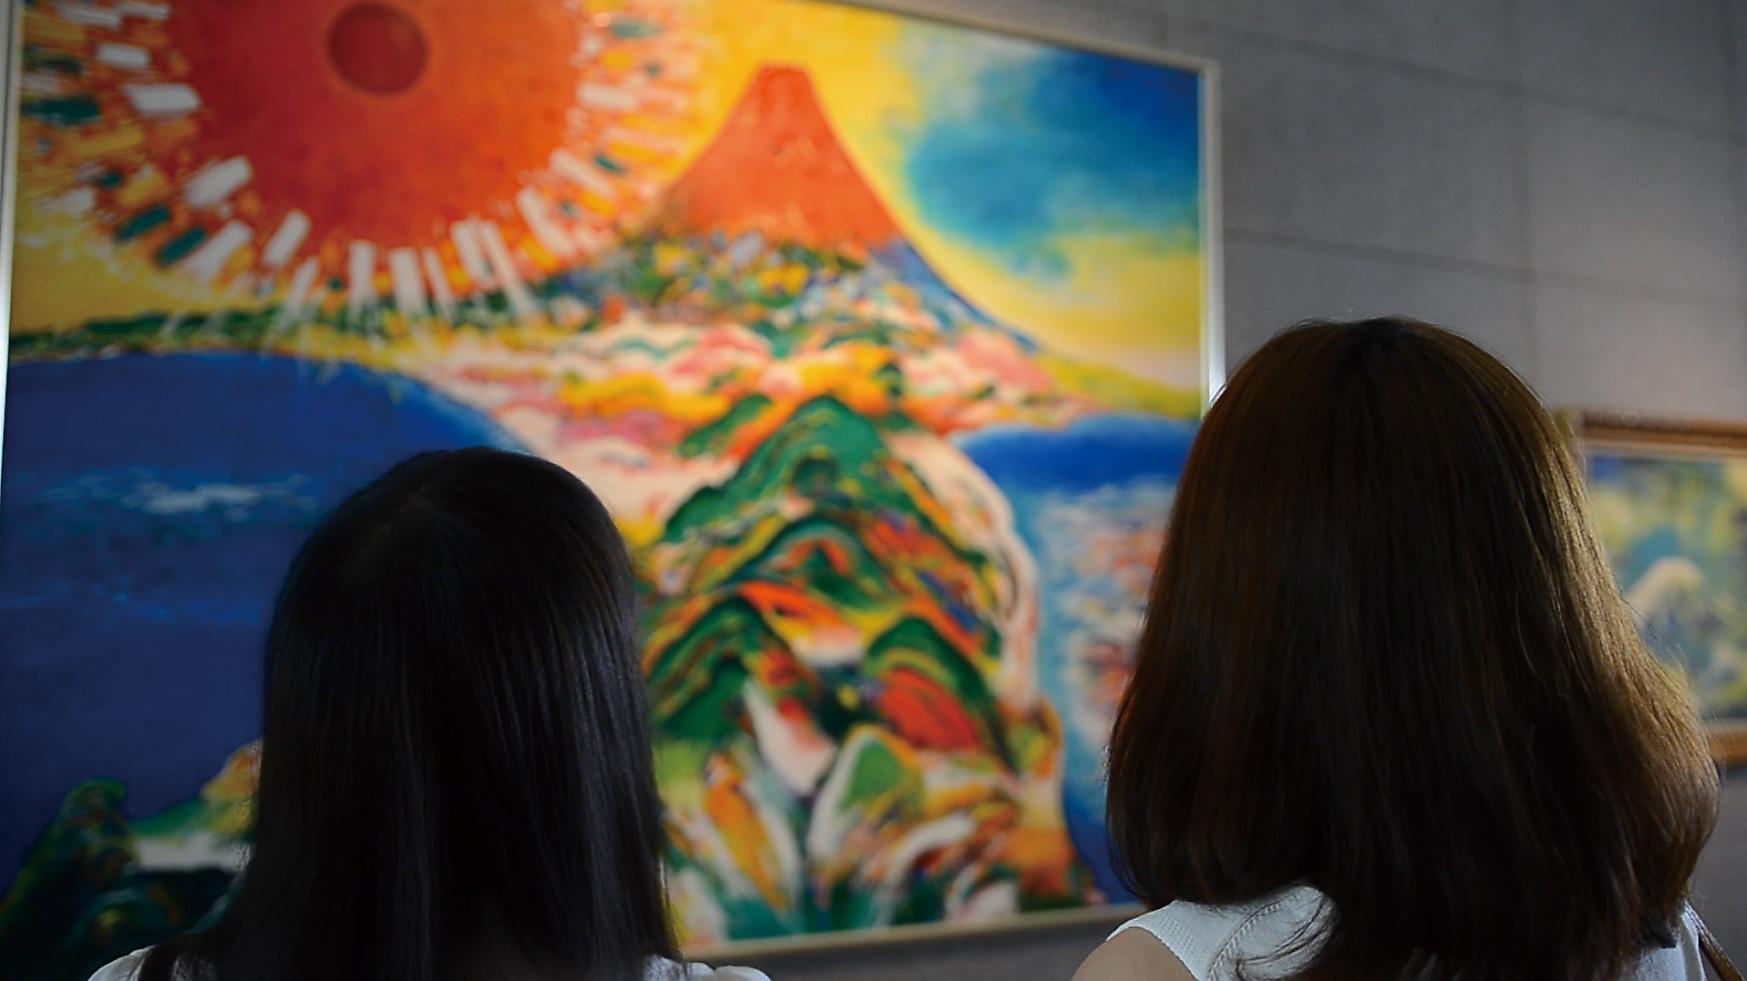 Kawaguchiko Museum of Art